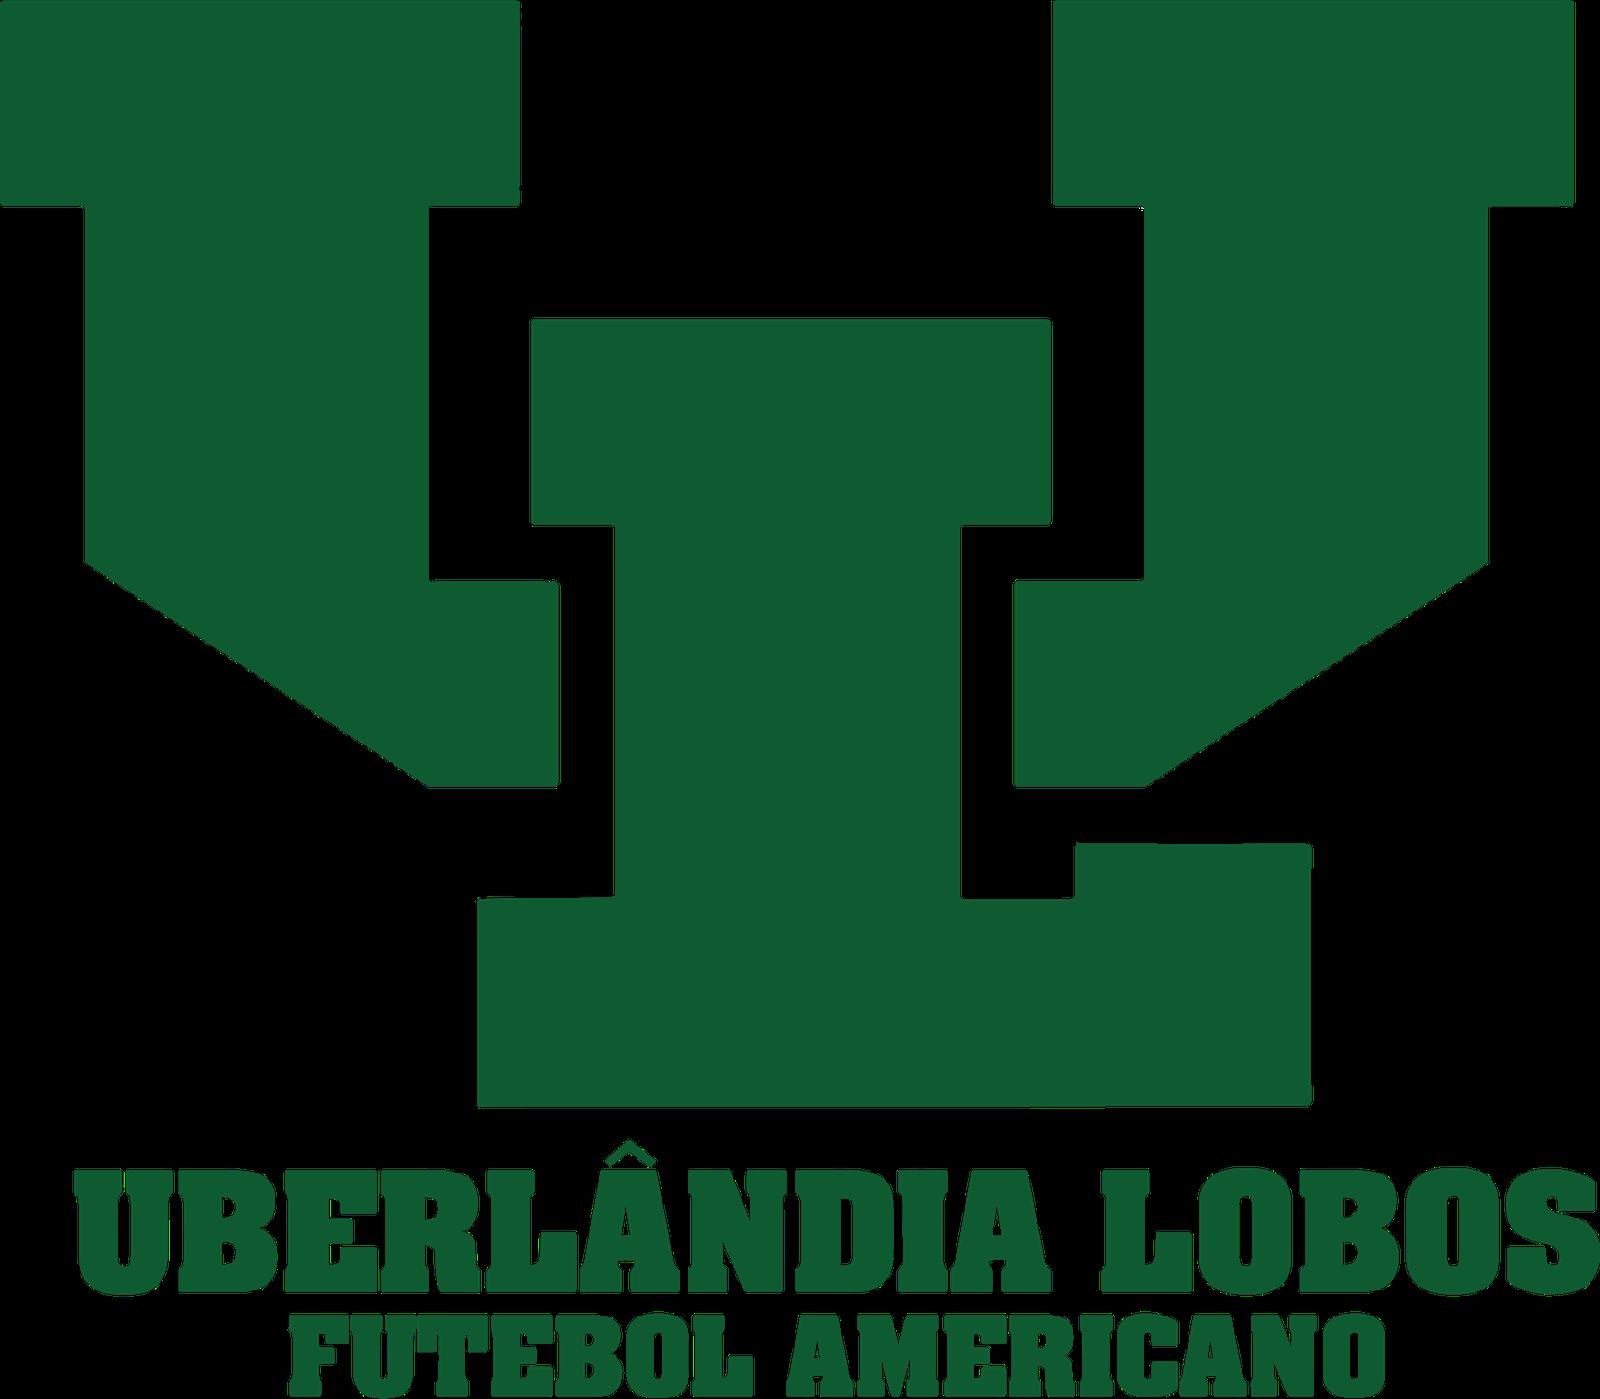 Uberlândia Lobos